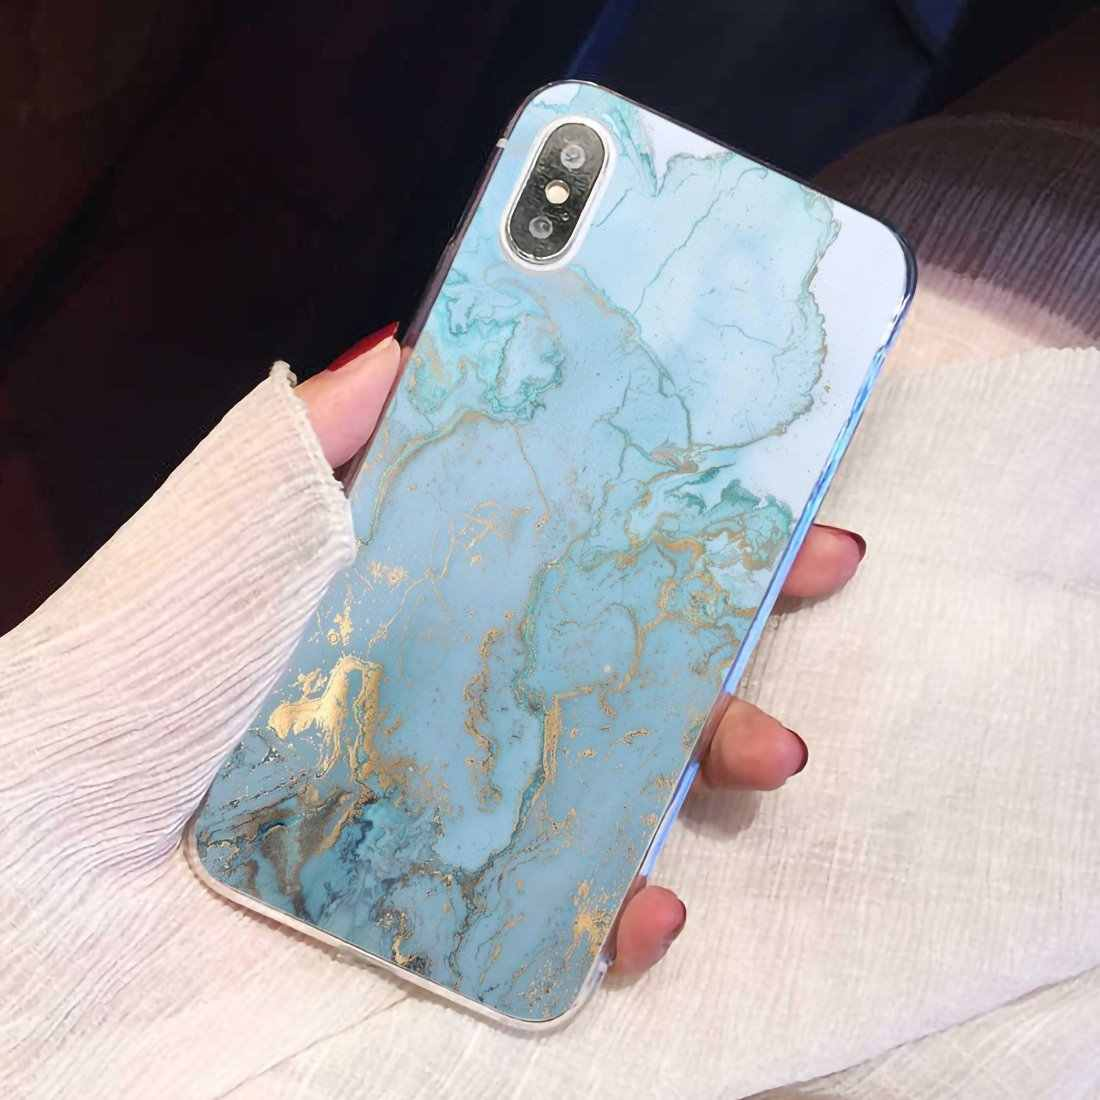 Lüks mermer taş ince silikon yumuşak TPU telefon samsung kılıfı Galaxy J1 J2 J3 J4 J5 J6 J7 J8 artı 2018 prime 2015 2016 2017